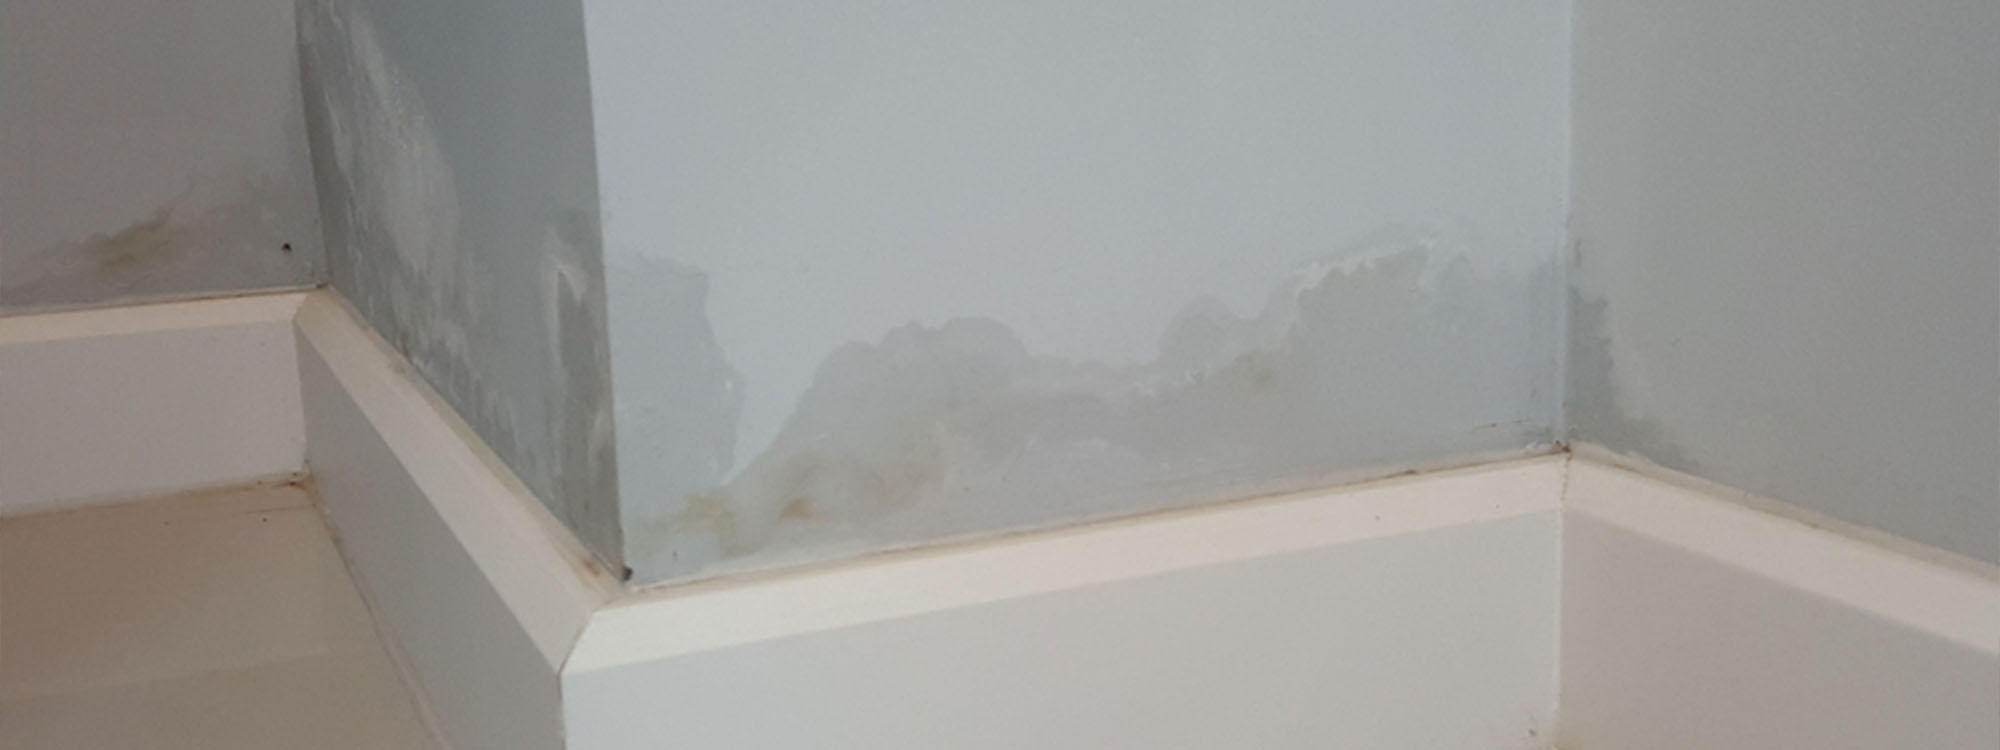 damp blue wall above floor skirting